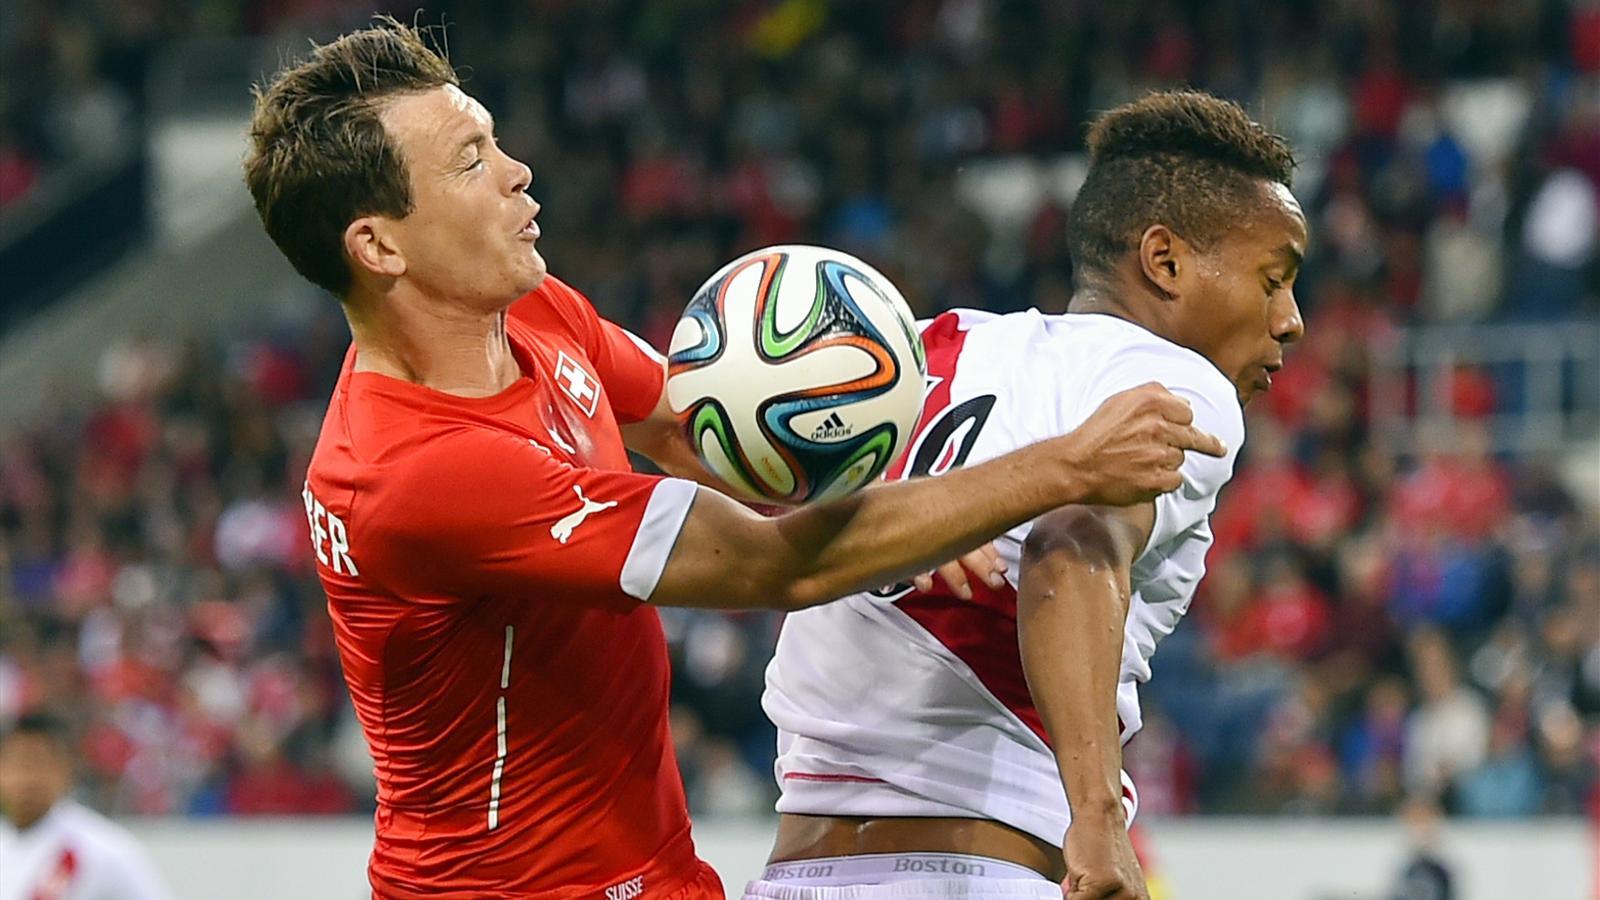 Match Suisse Vs Perou